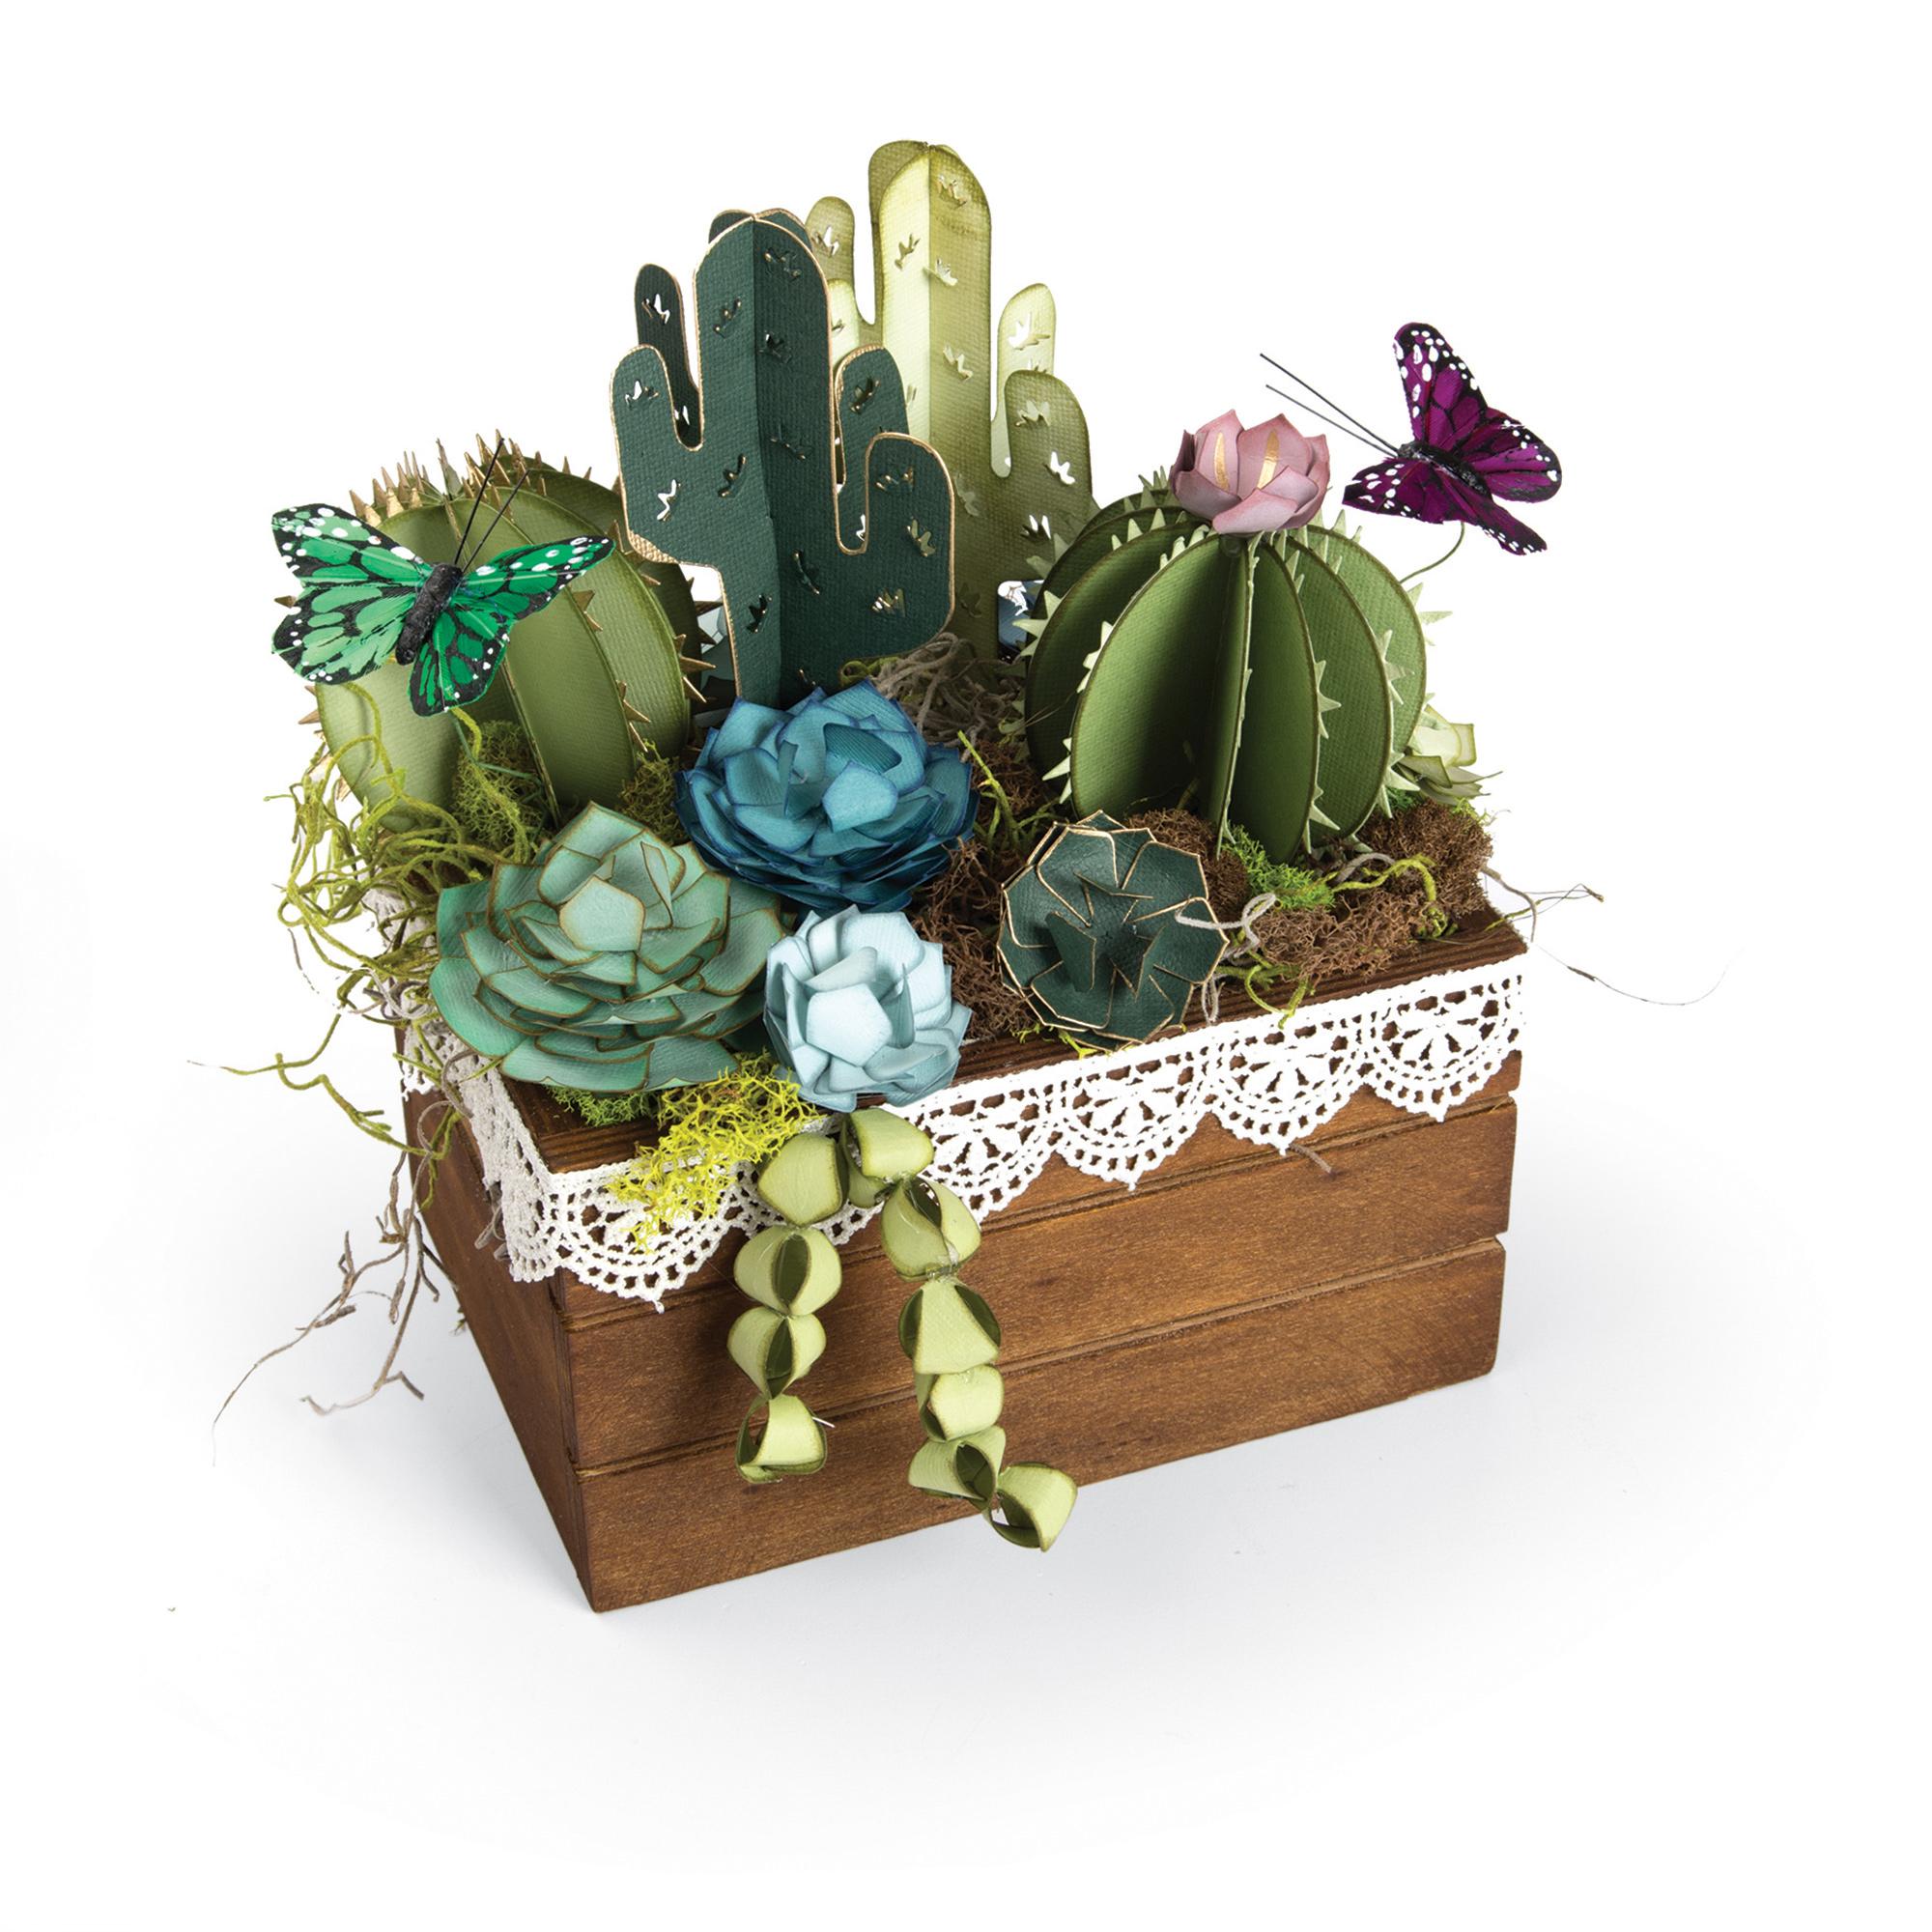 Sizzix Thinlits Dies - Succulents, 2-D & 3-D by Lynda Kanase